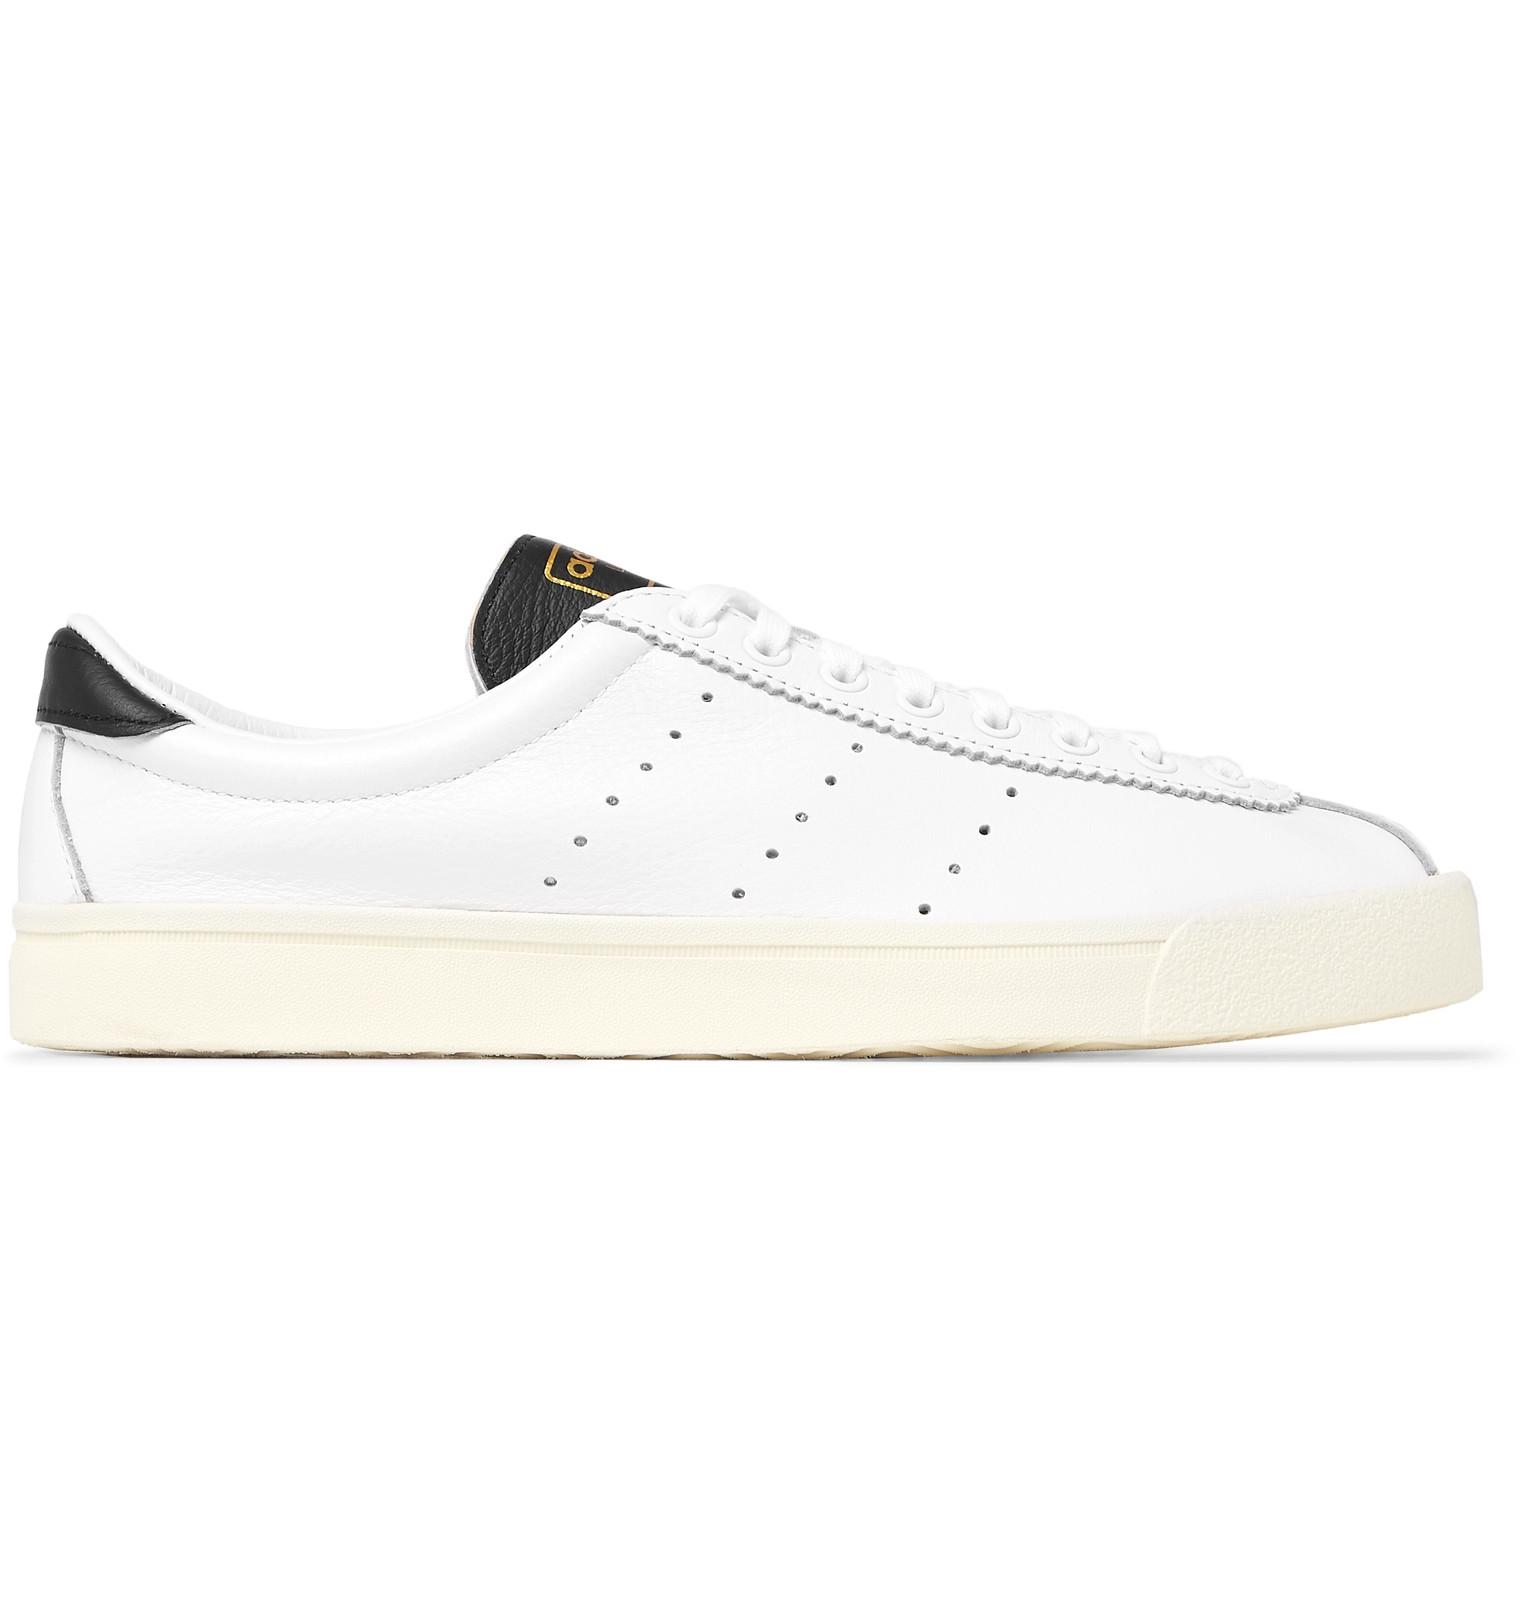 quality design 427df f2c66 adidas Originals - Lacombe Leather Sneakers